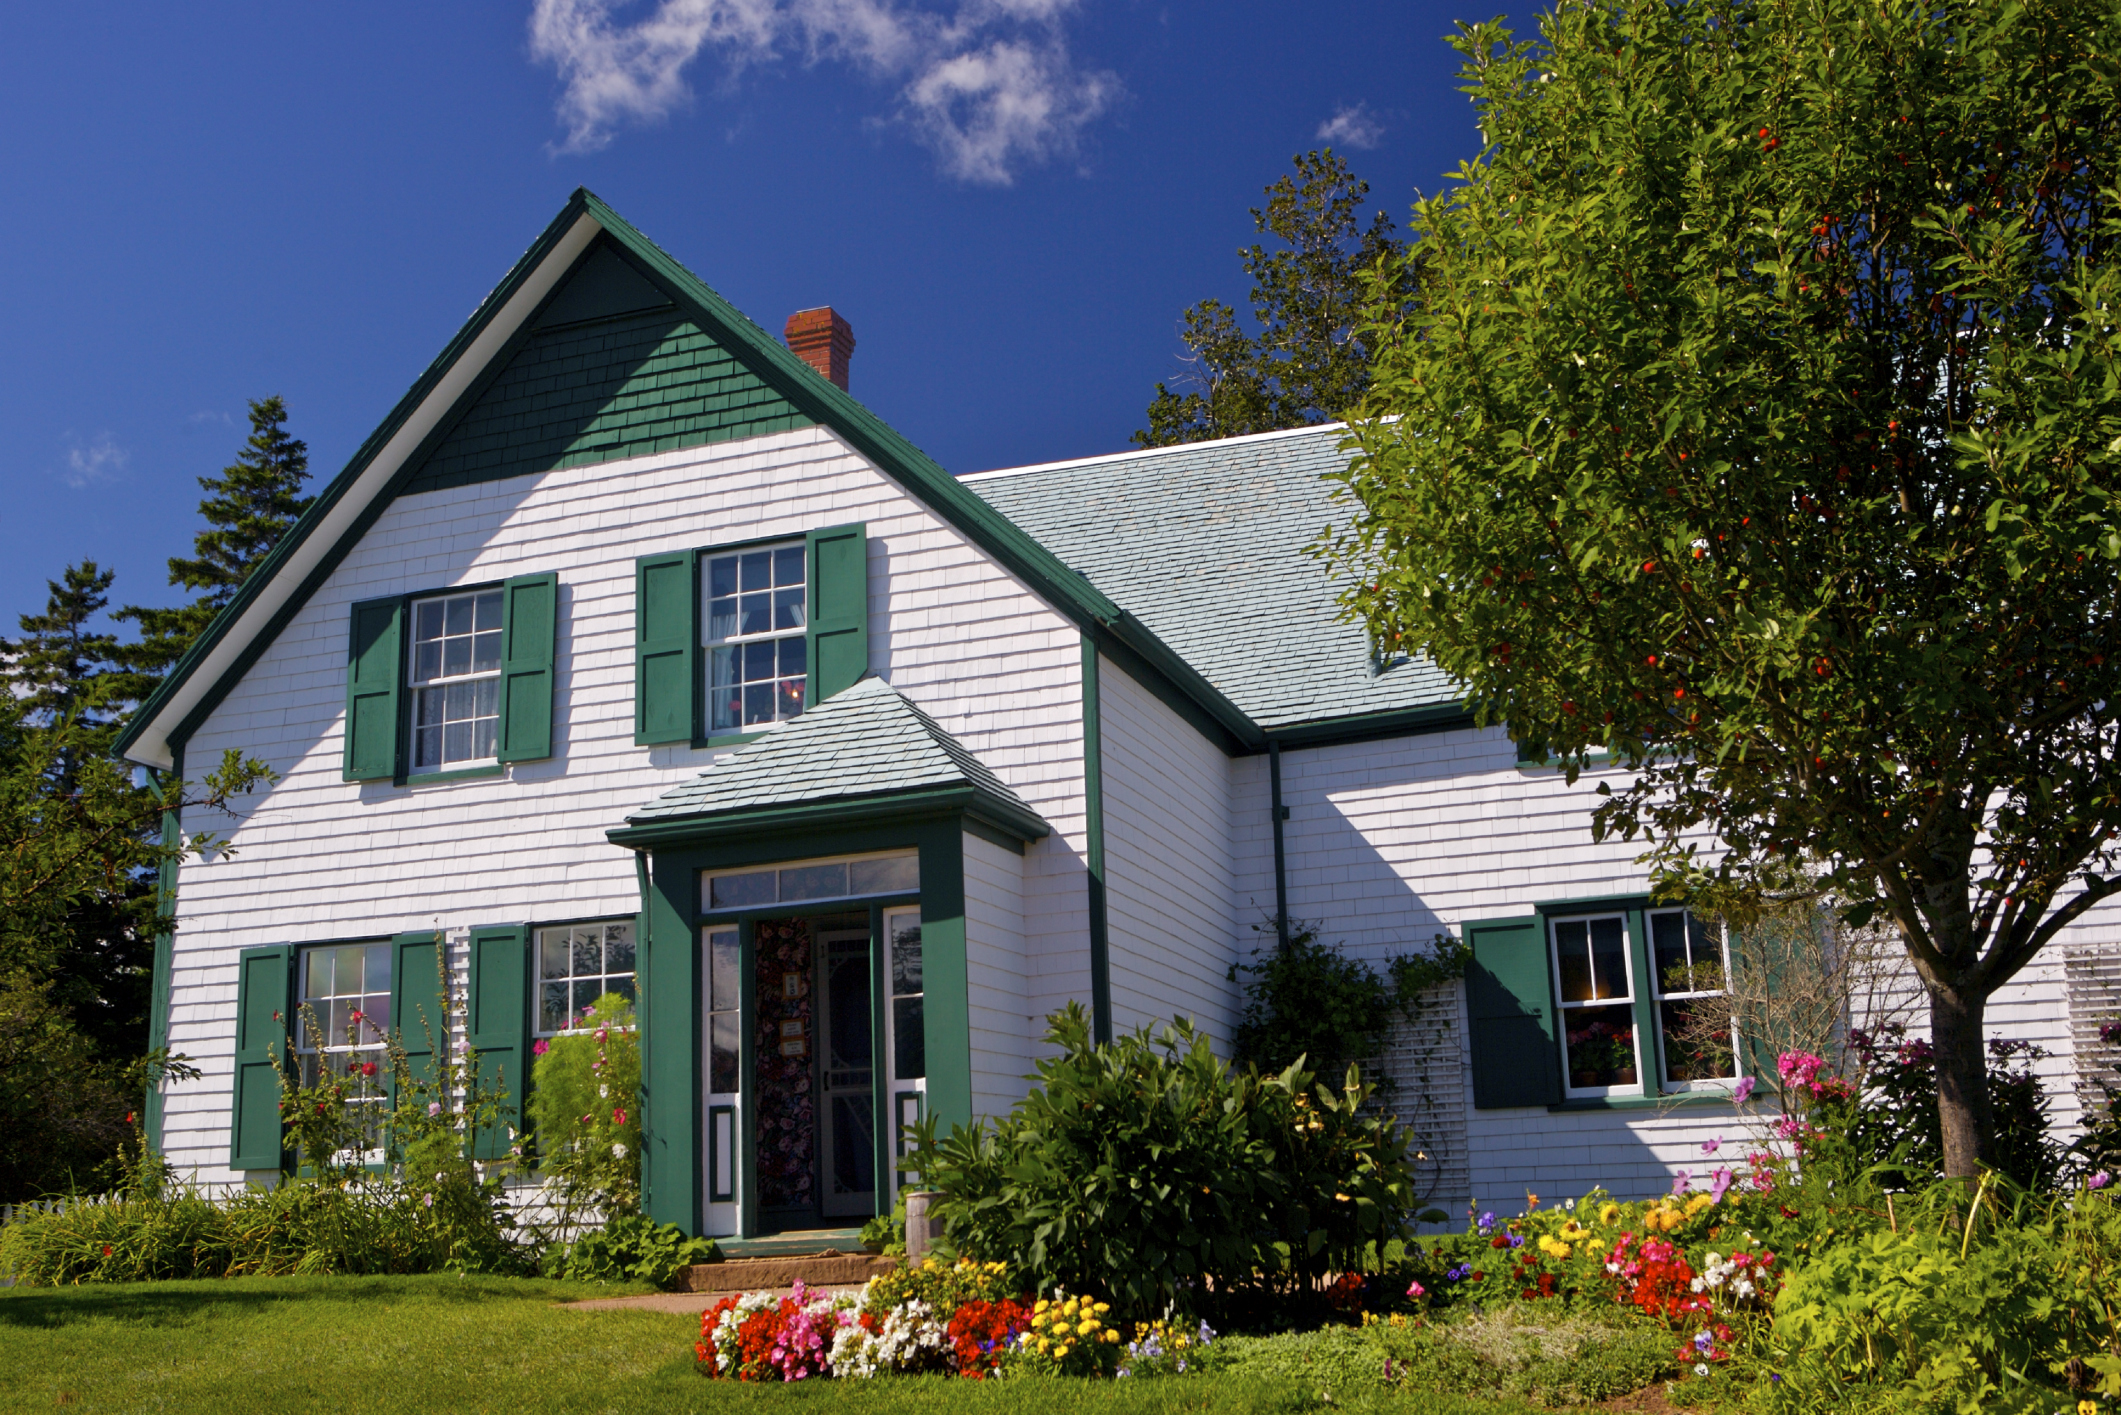 Beautiful farms on prince edward island canada real for Classic house at akasaka prince